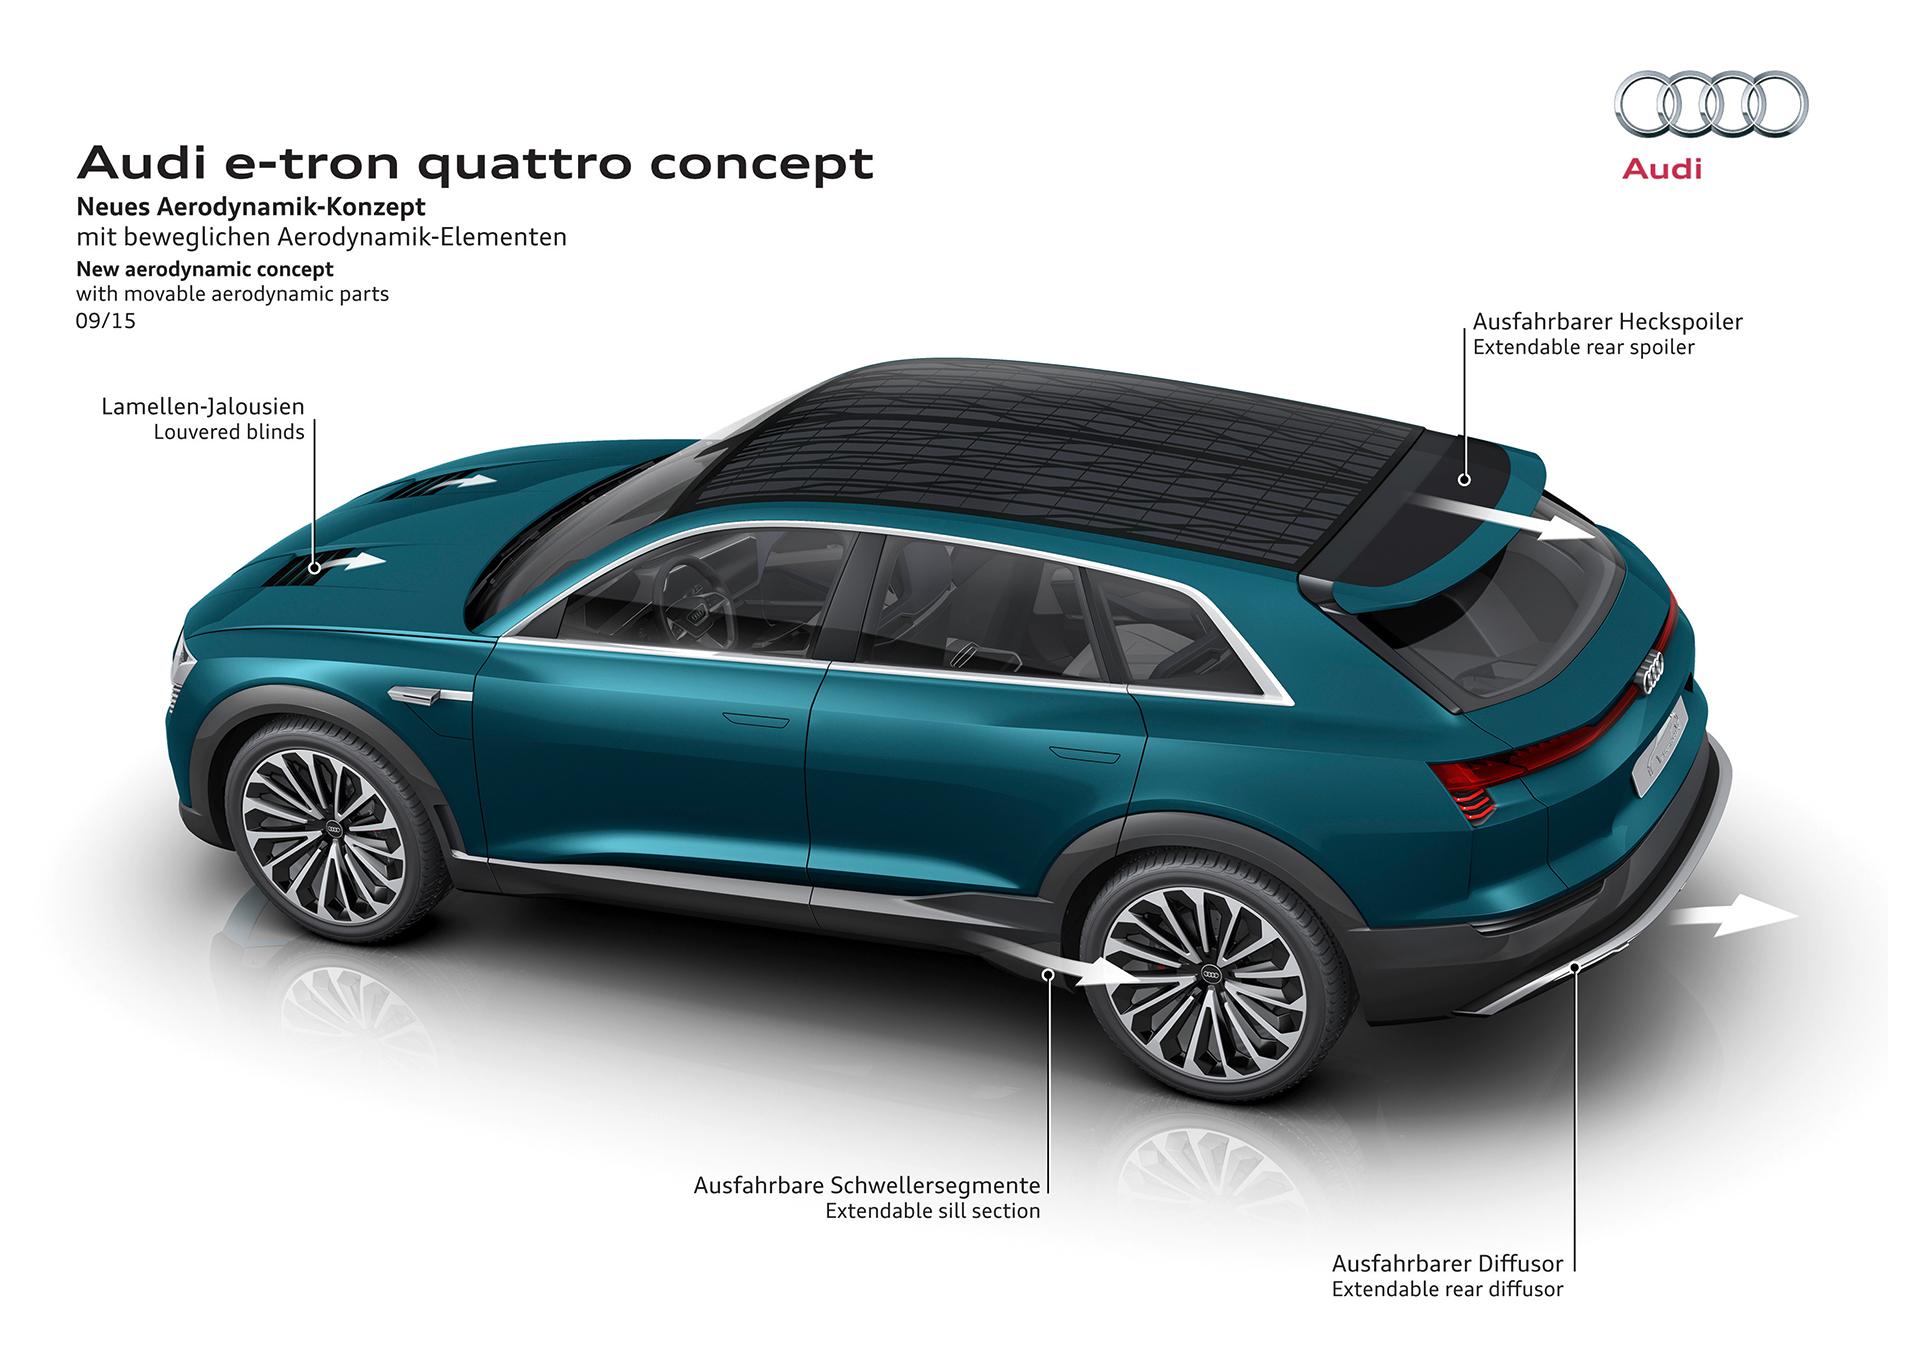 Audi e-tron quattro concept - 2016 - aerodynamic